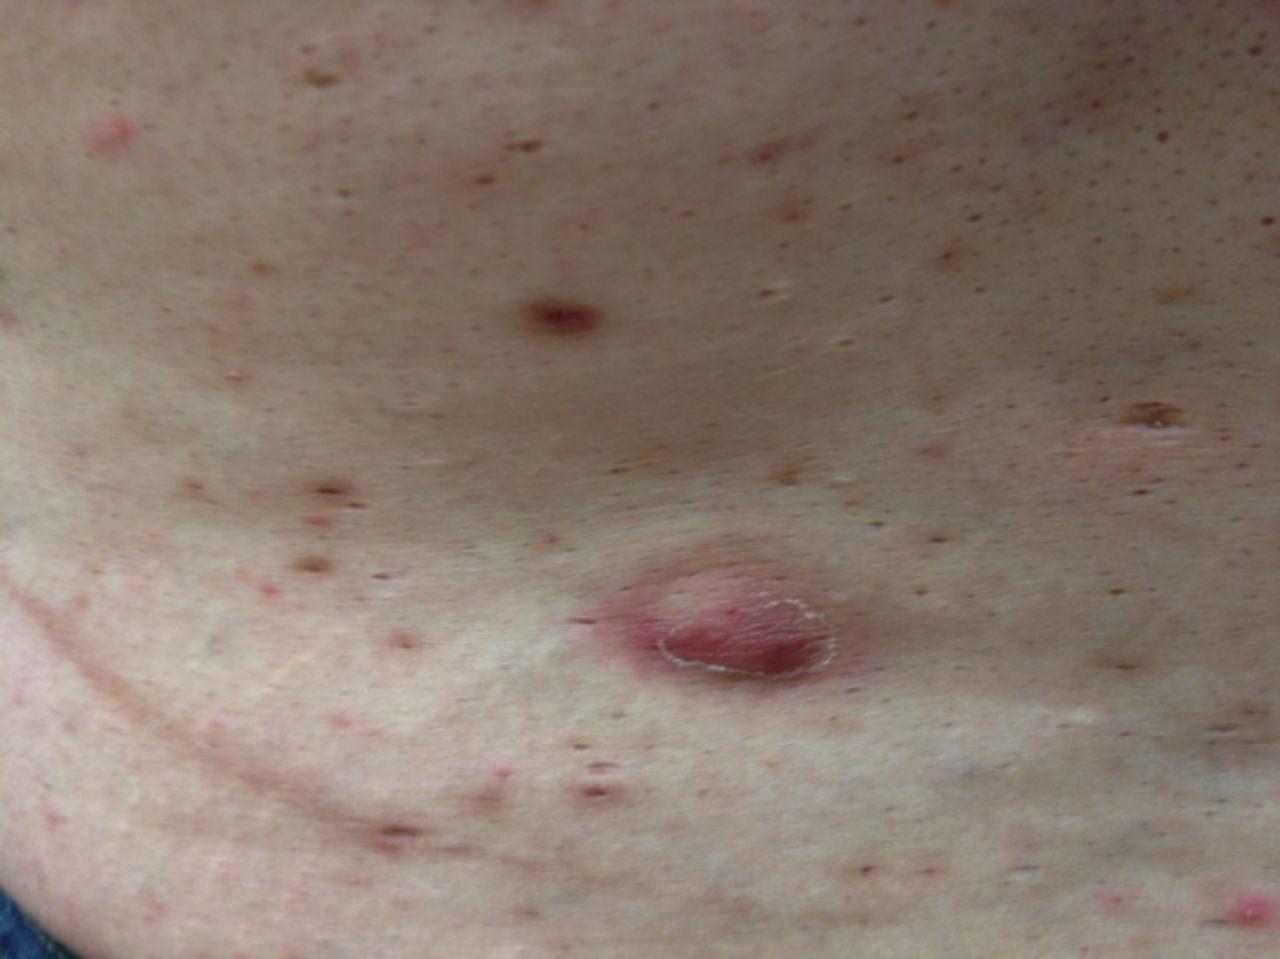 Hidradenitis suppurativa: a case study | HSAWARENESS.ORG